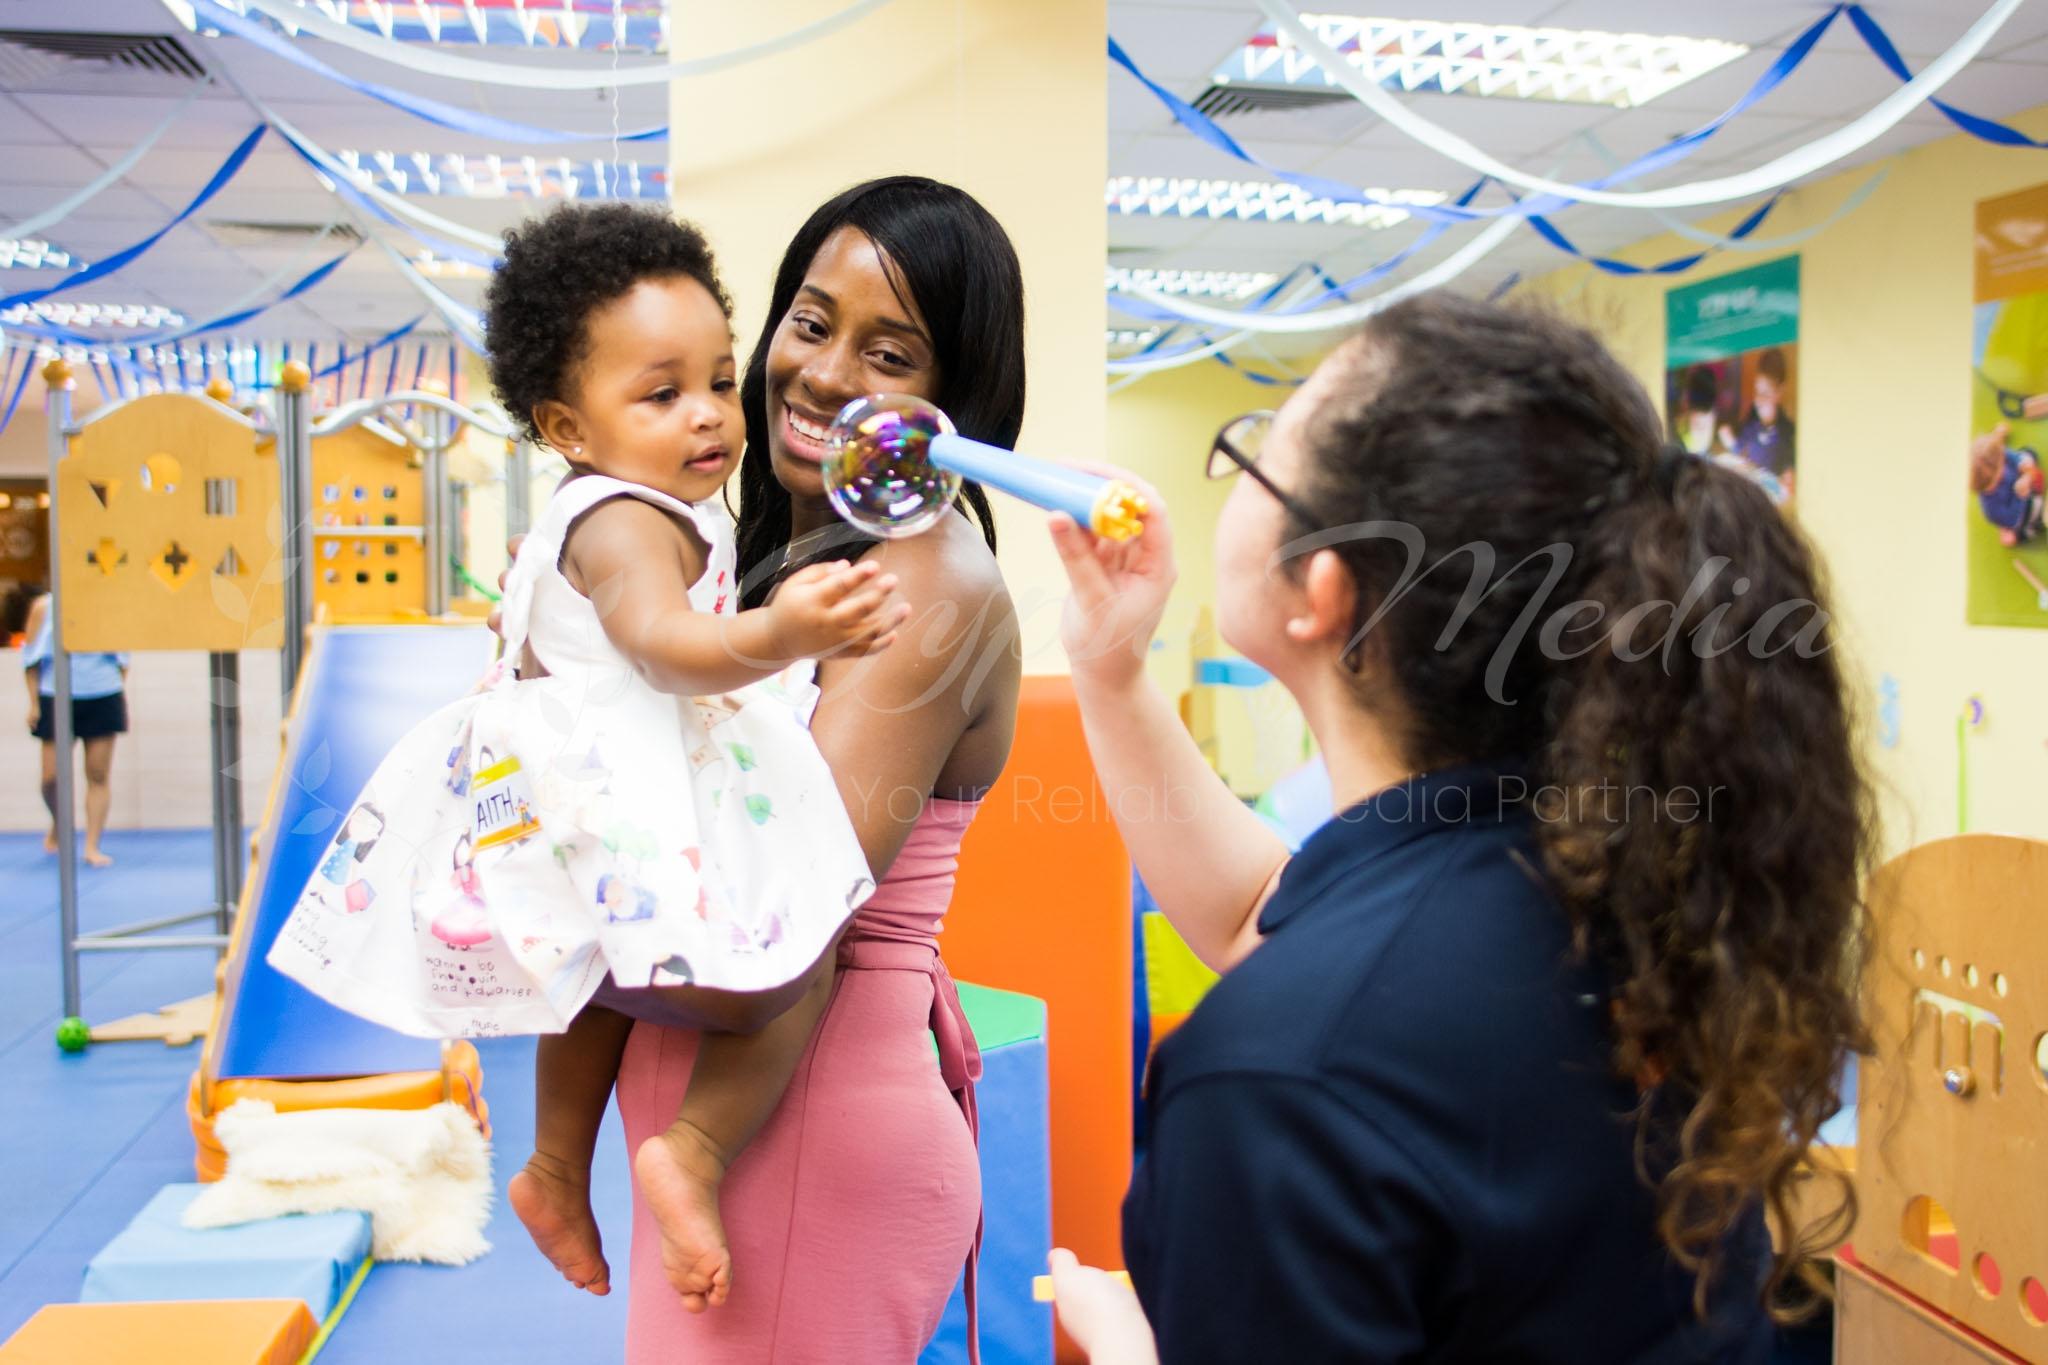 Baby Portrait Photography | Gypso Media